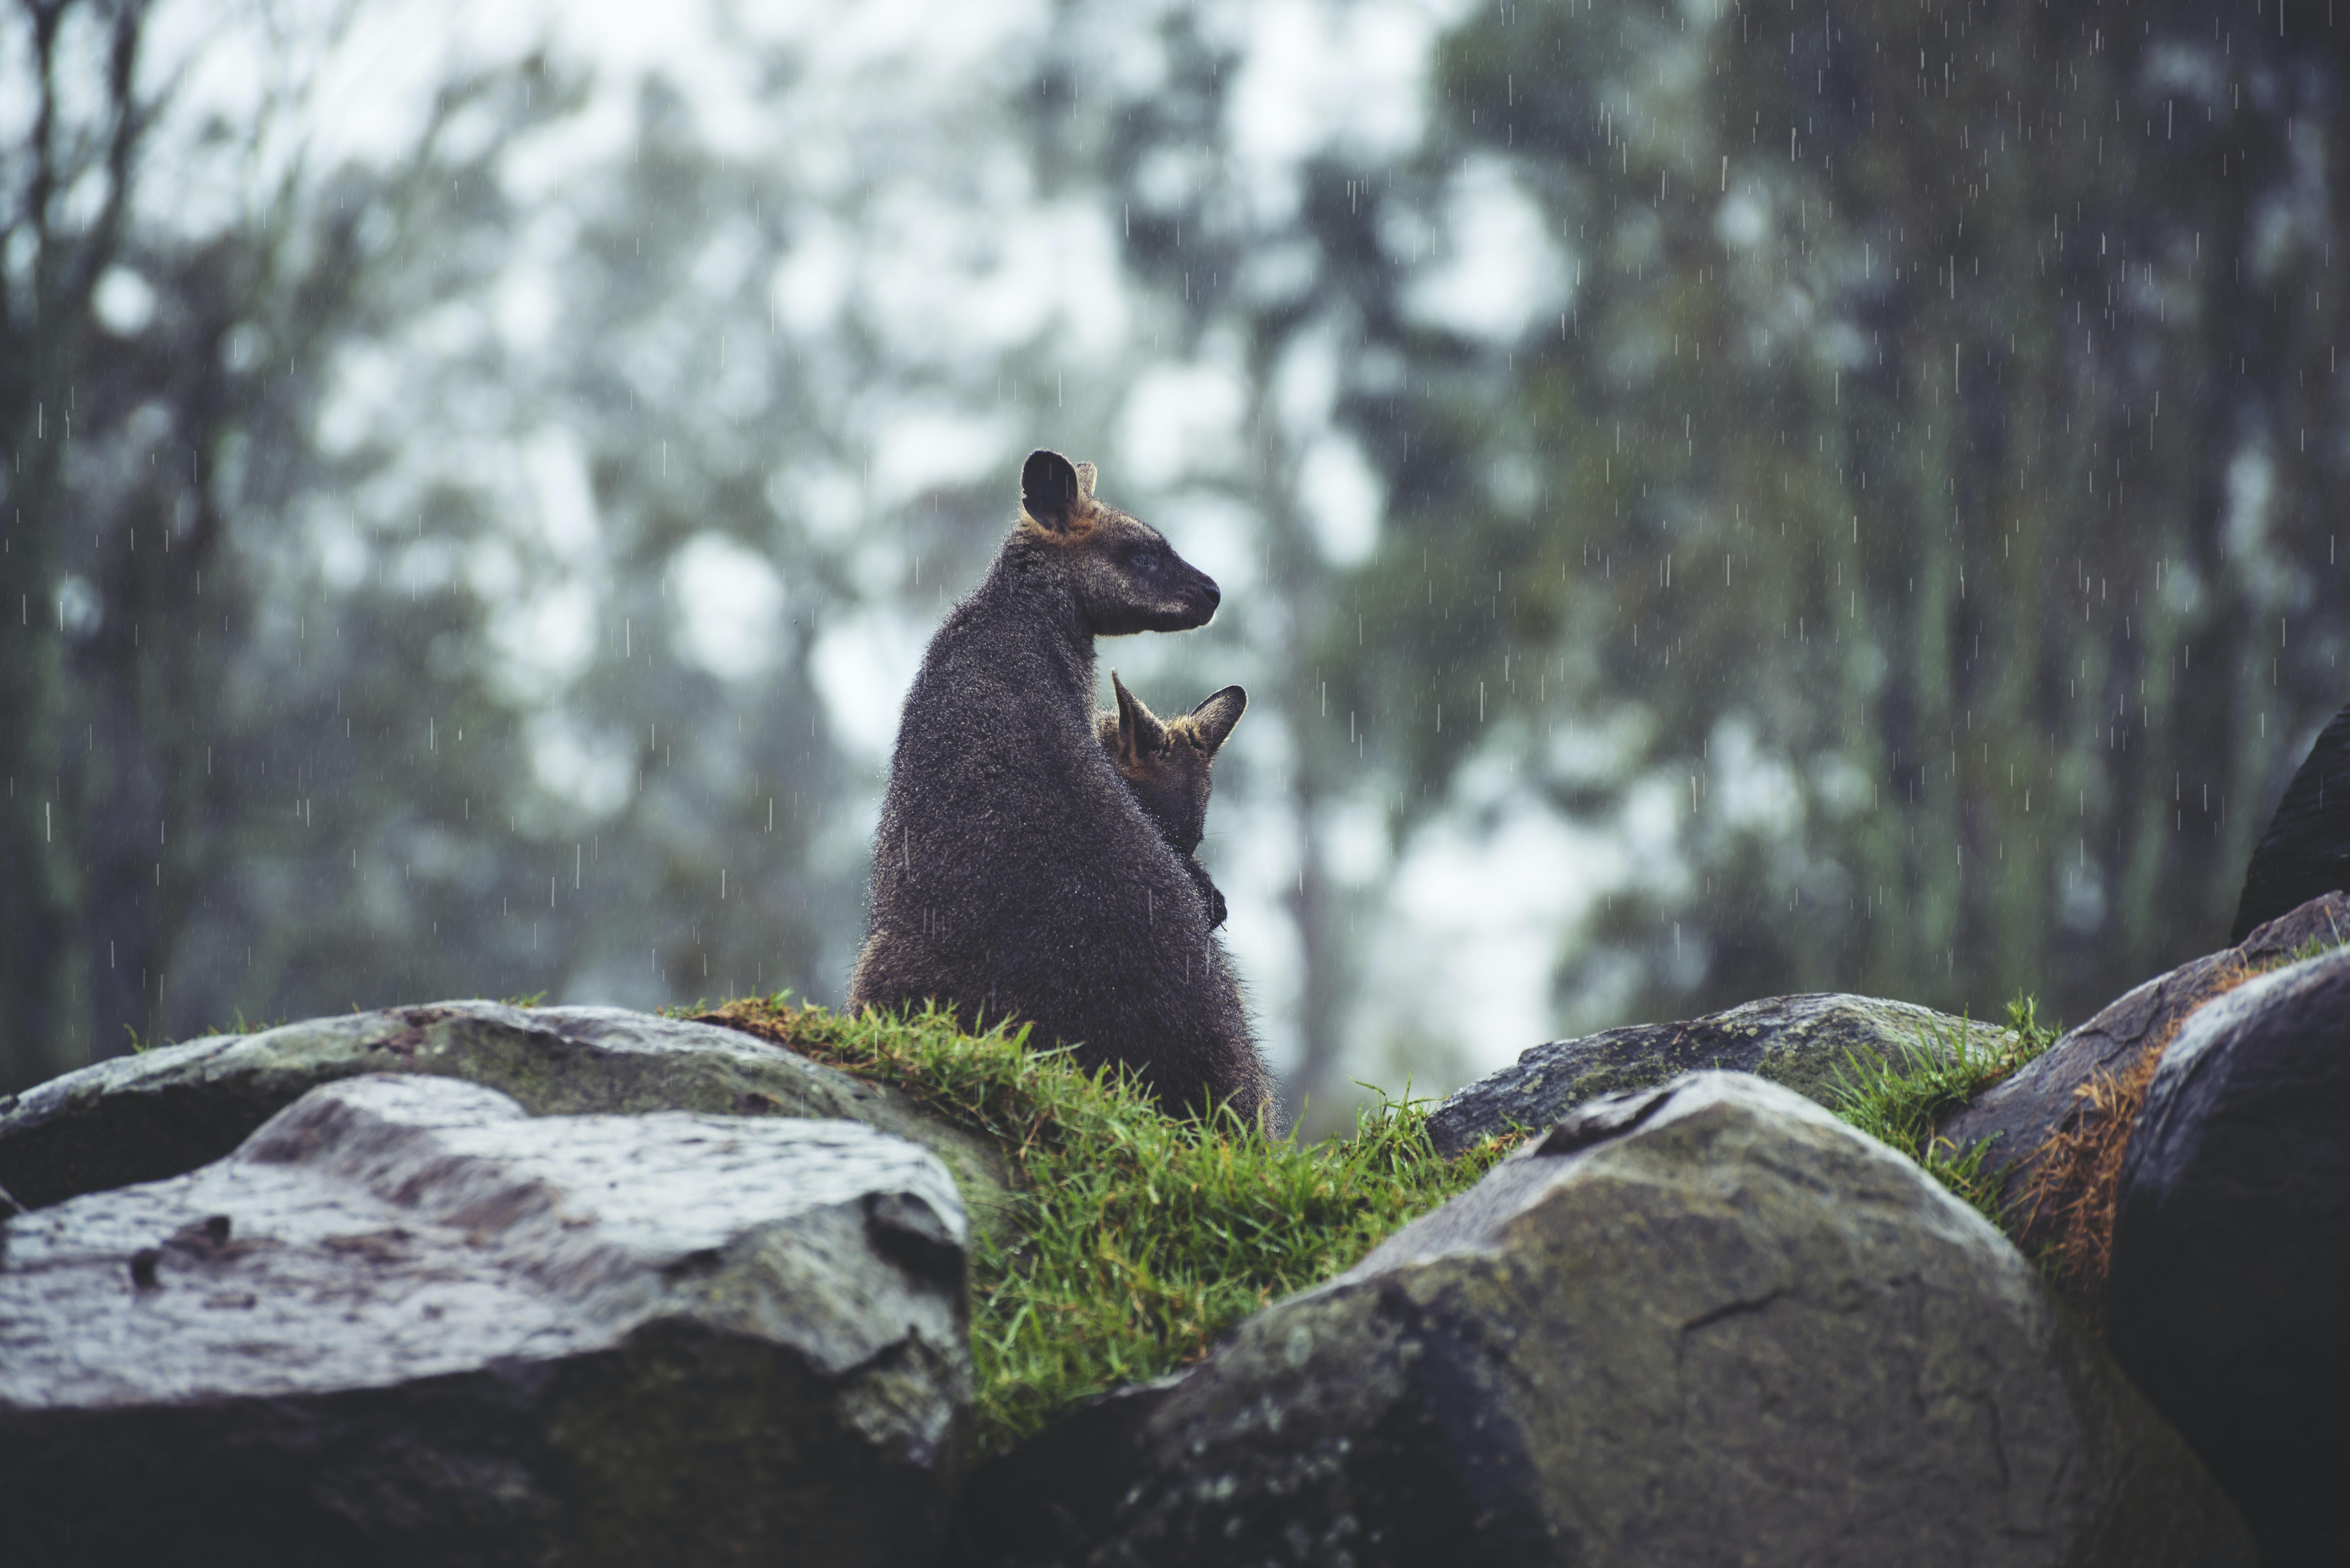 A kangaroo mama and joey are snuggled close on a rocky ledge under light rain